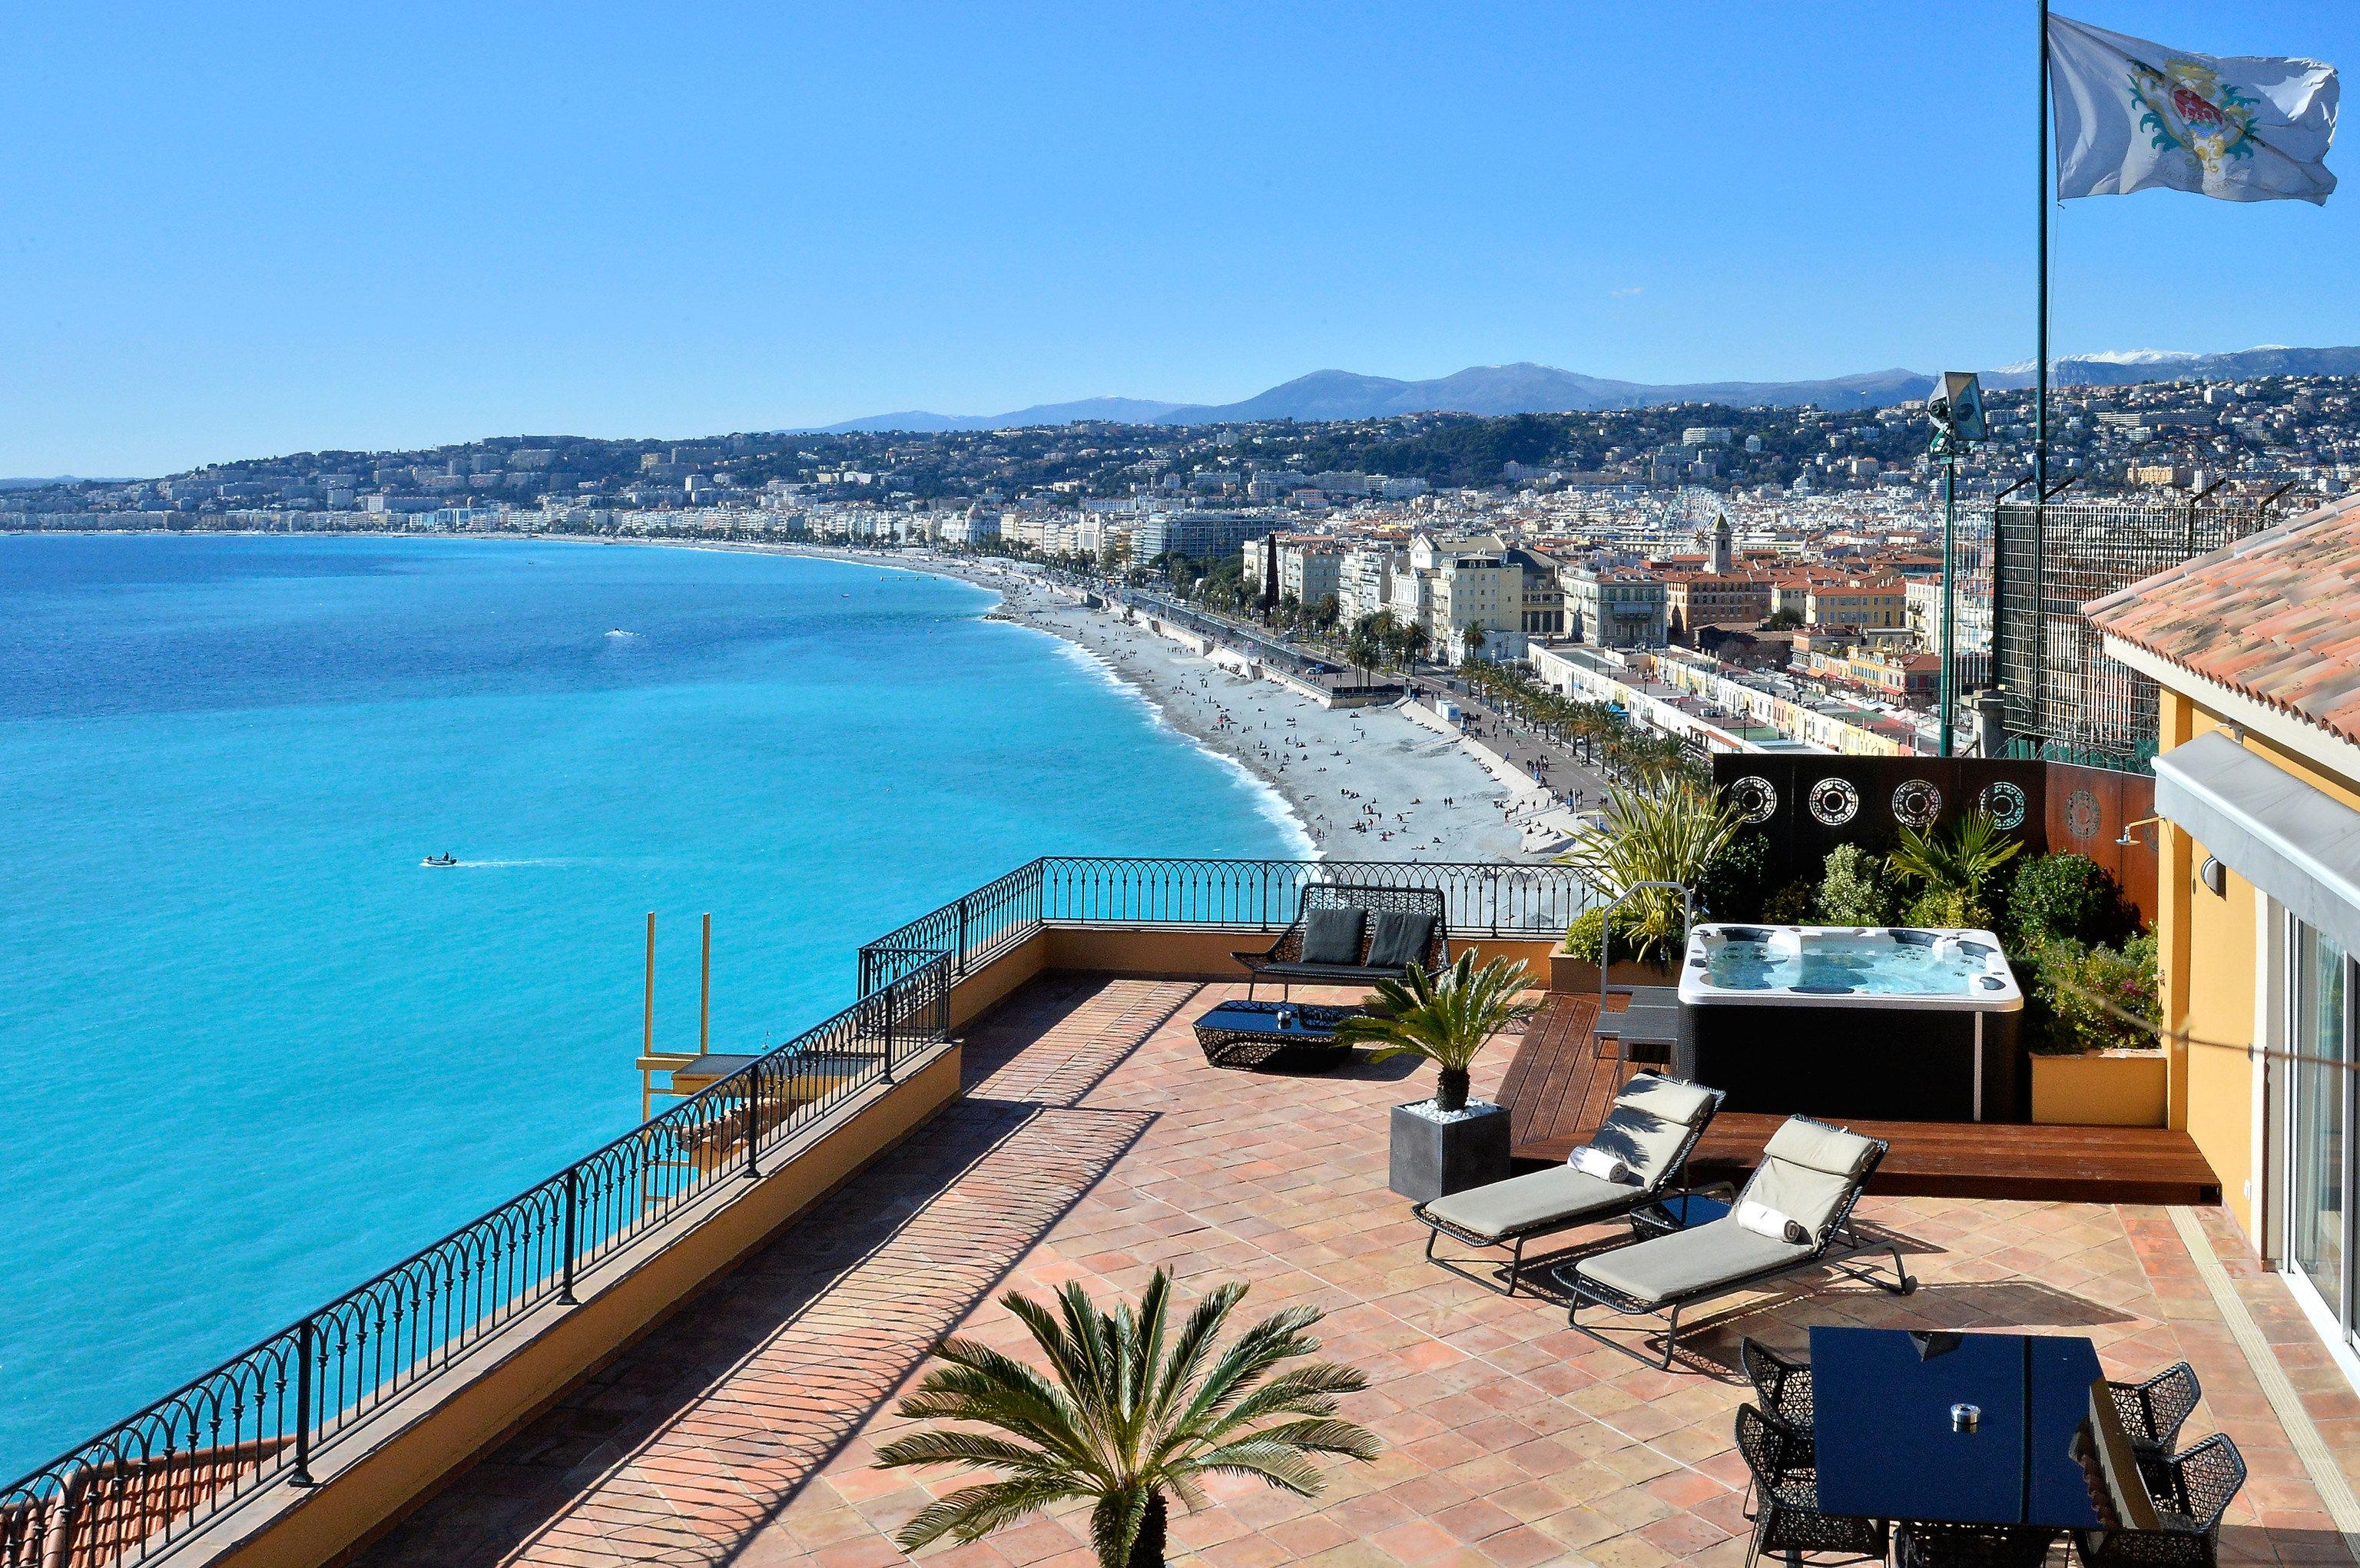 sky water property Sea Coast swimming pool Resort marina walkway condominium dock overlooking